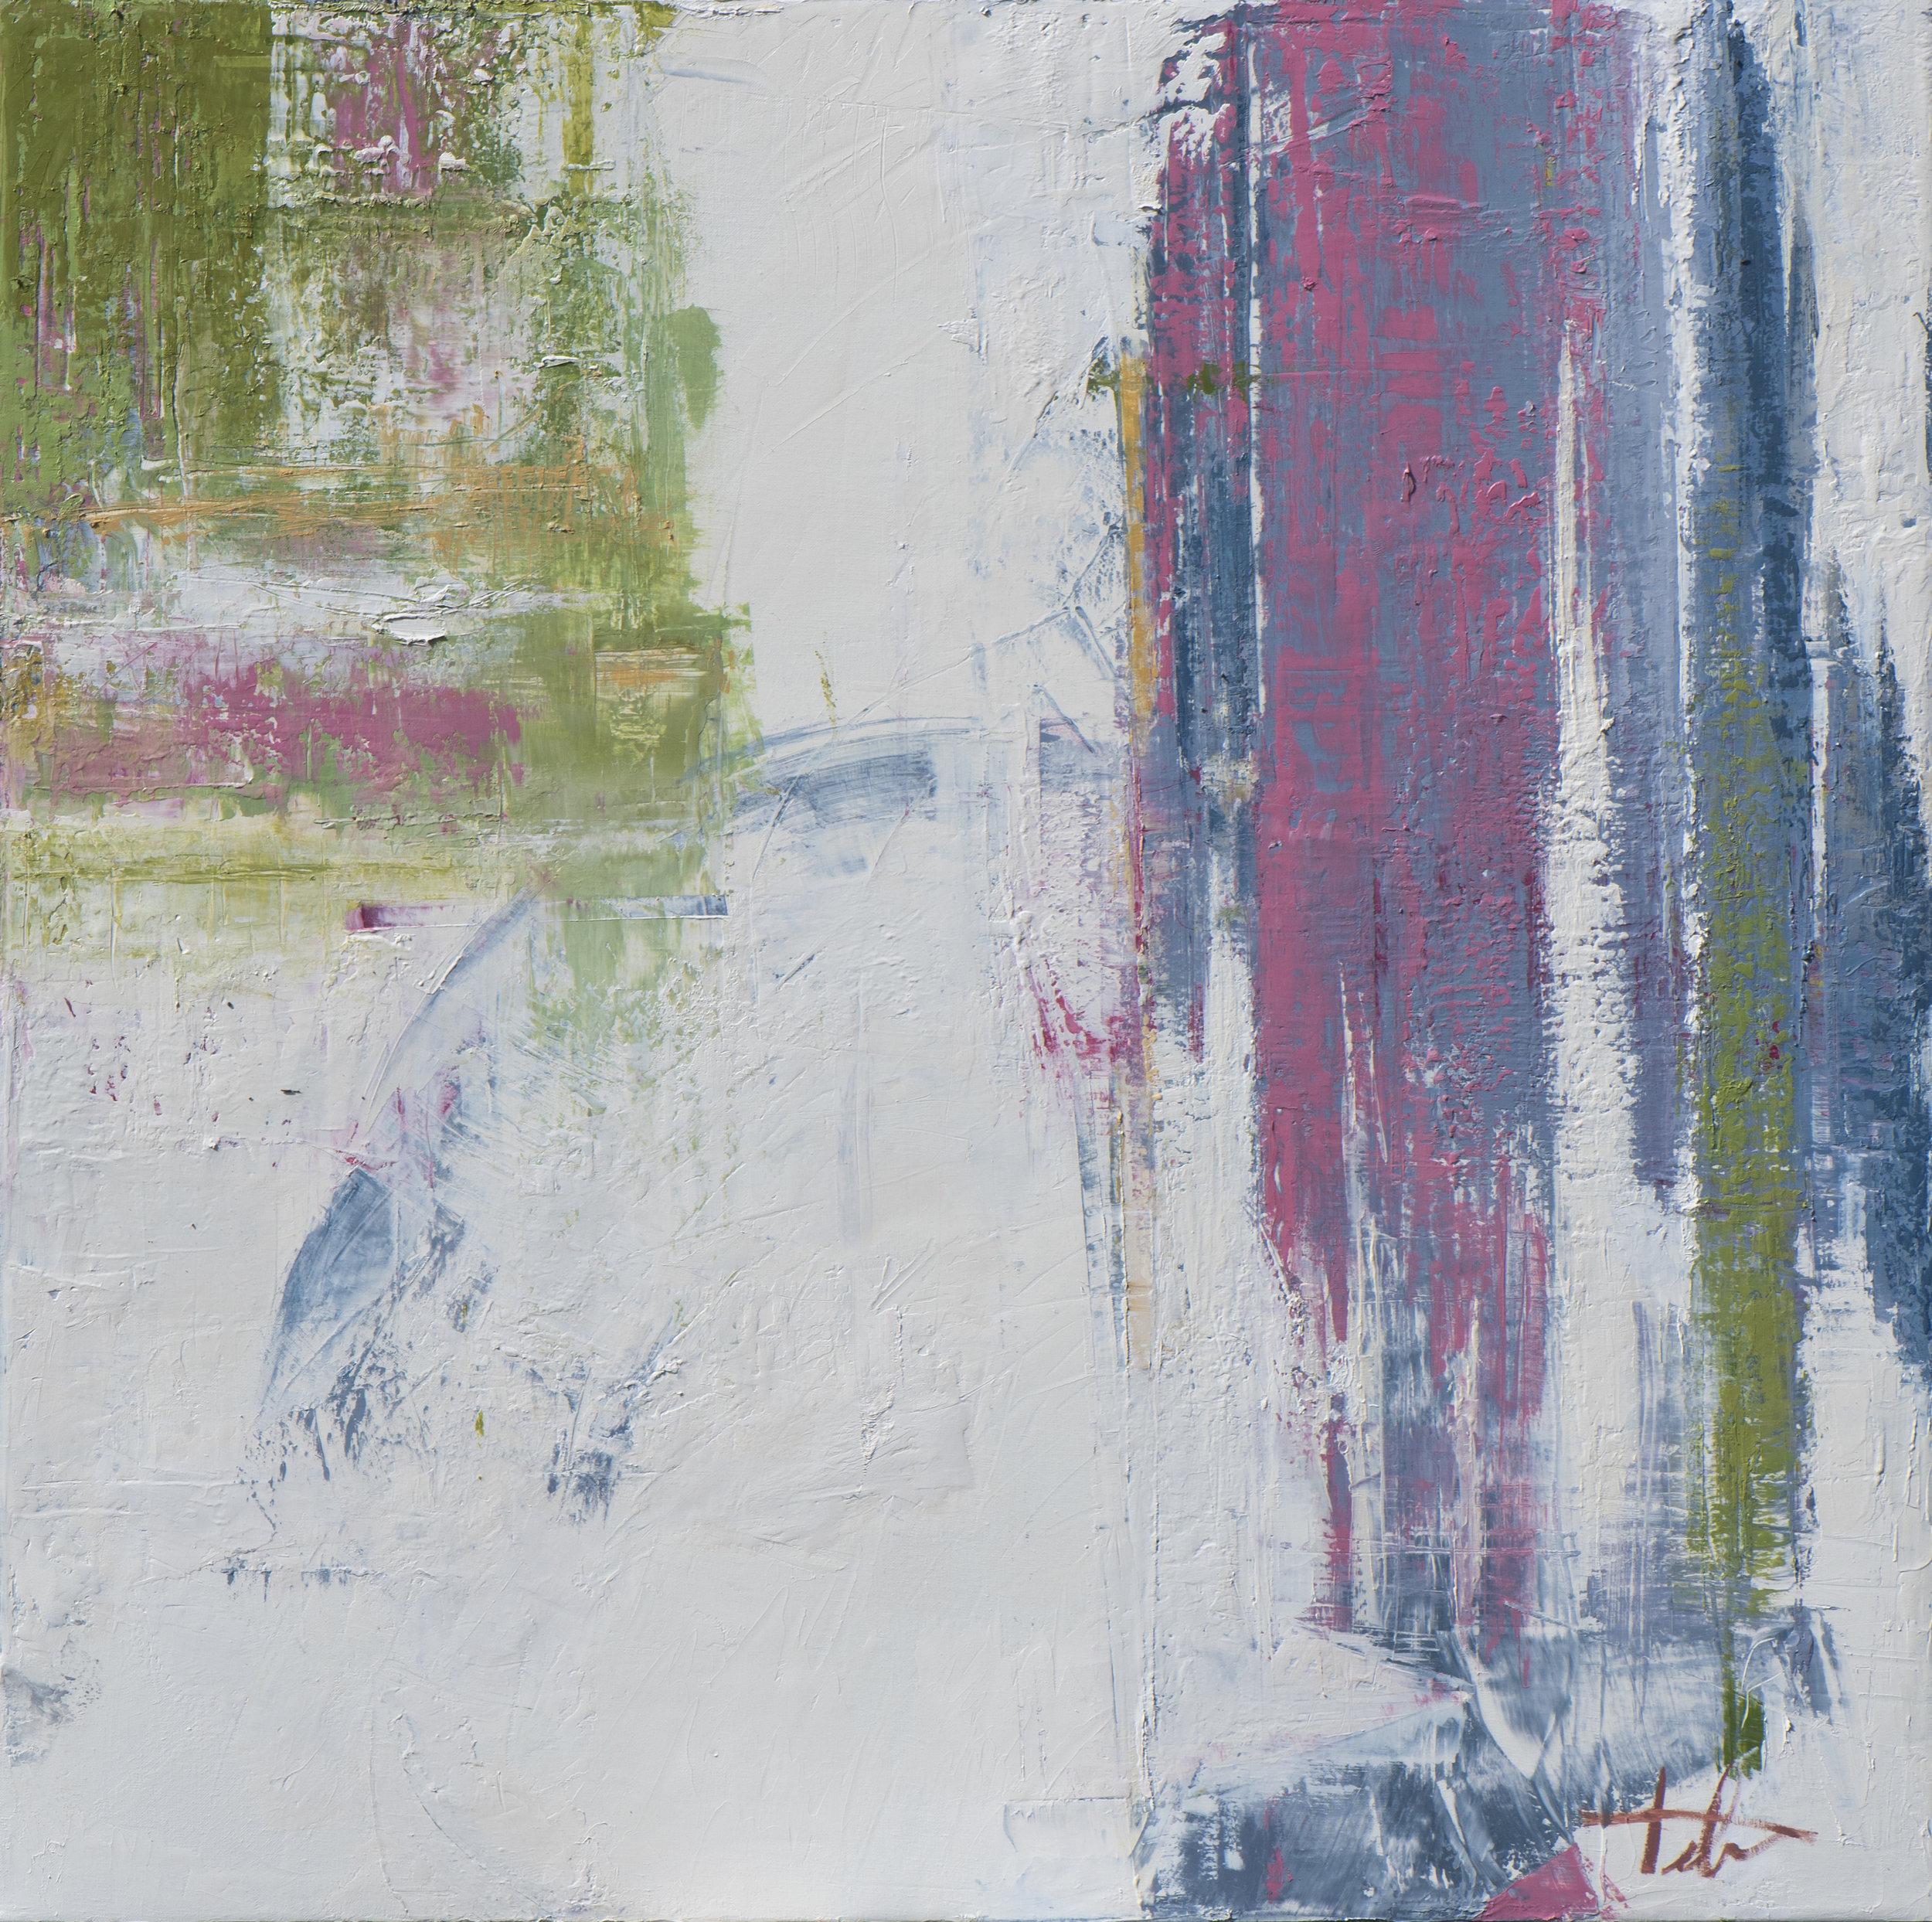 "Glass House Diptych 1 • Oil on canvas • 42 x 42"""